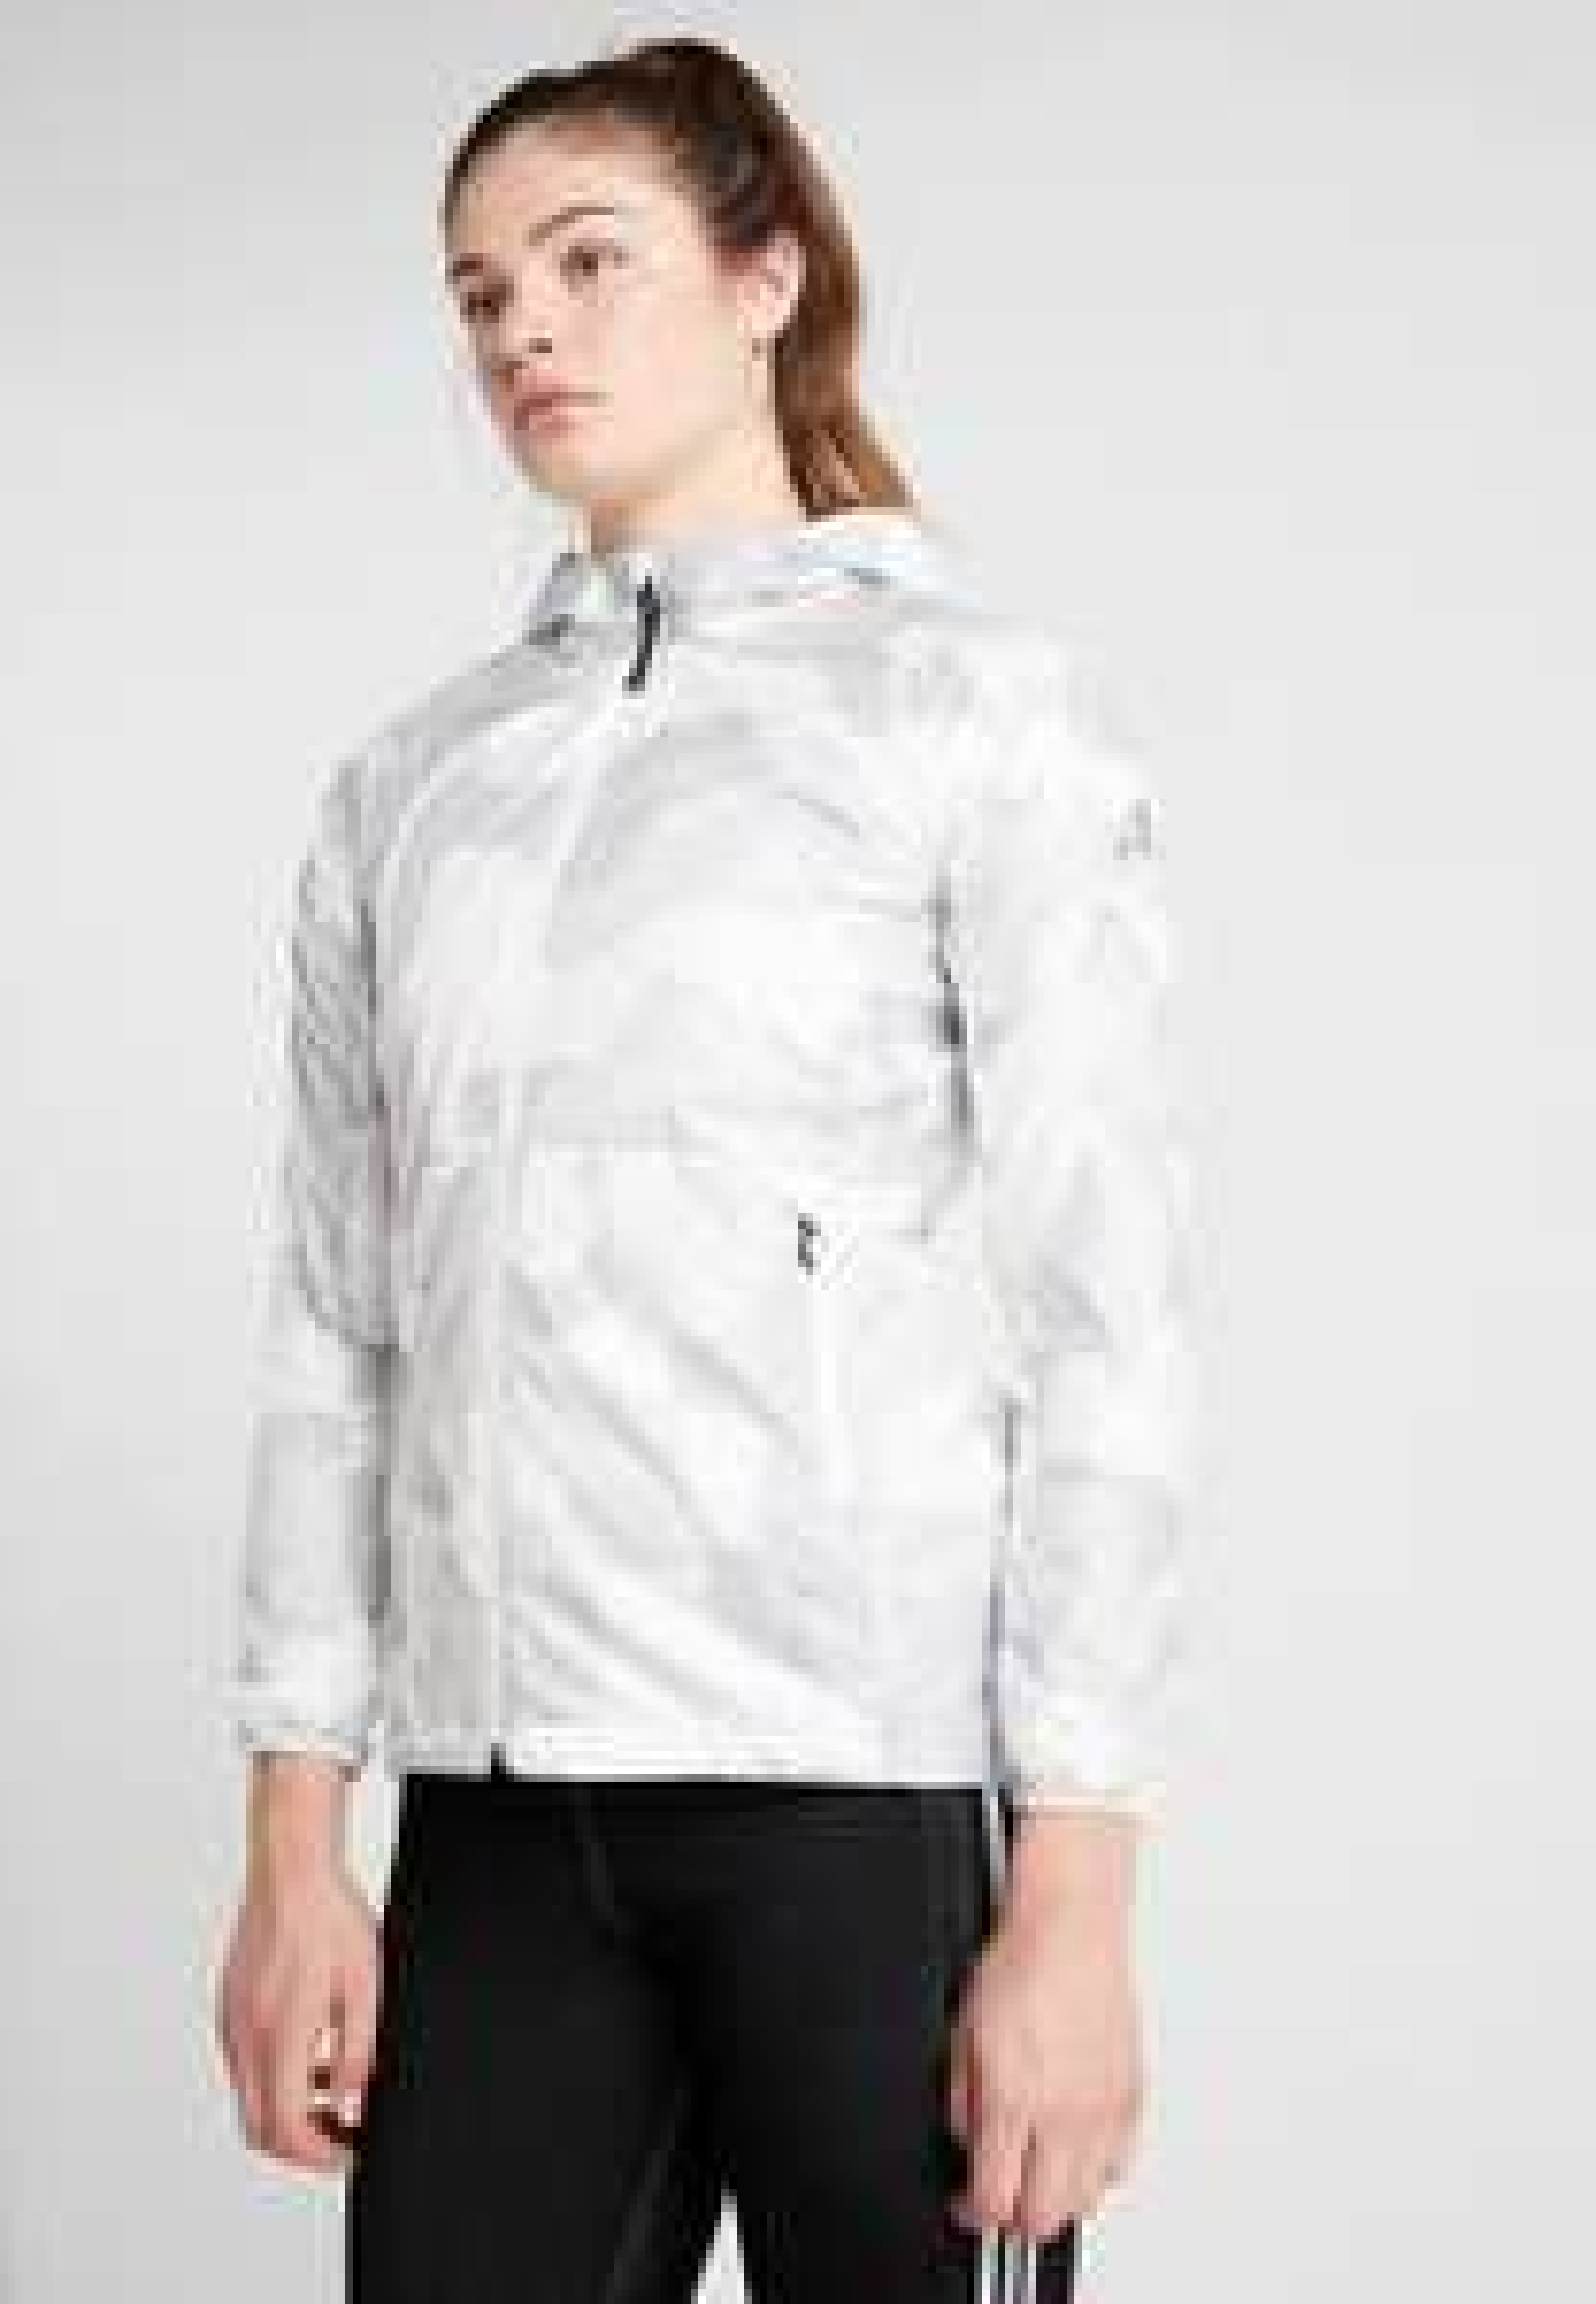 Adidas Camo lining Winderbreaker jacket £20.53 plus Free Birkenstock socks size 6, 10, 14, 18 @ Zalando